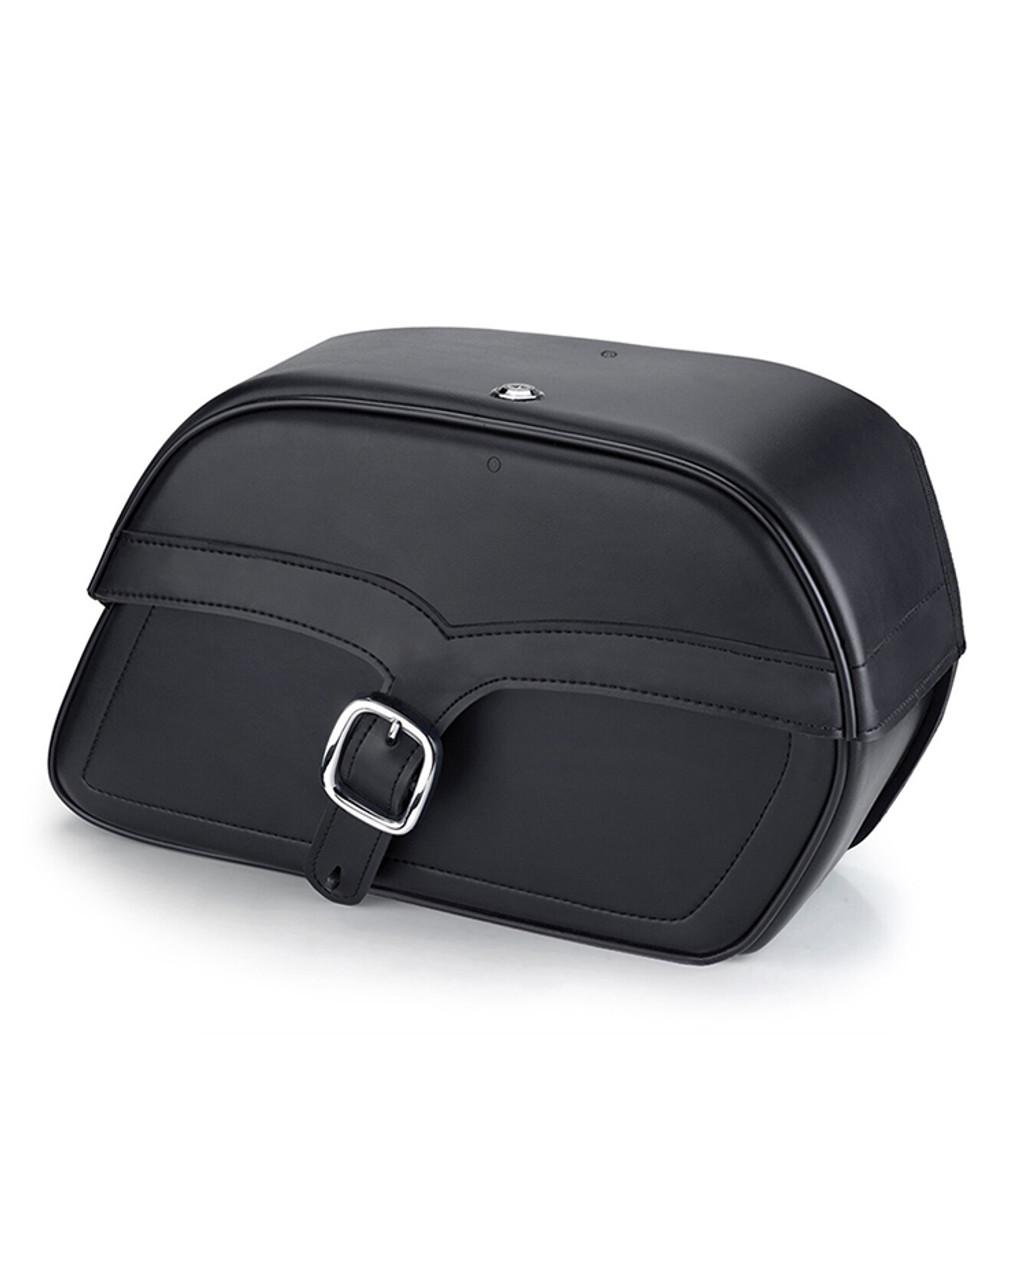 Suzuki Intruder 1500 VL1500 Charger Single Strap Large Motorcycle Saddlebags Main Bag View